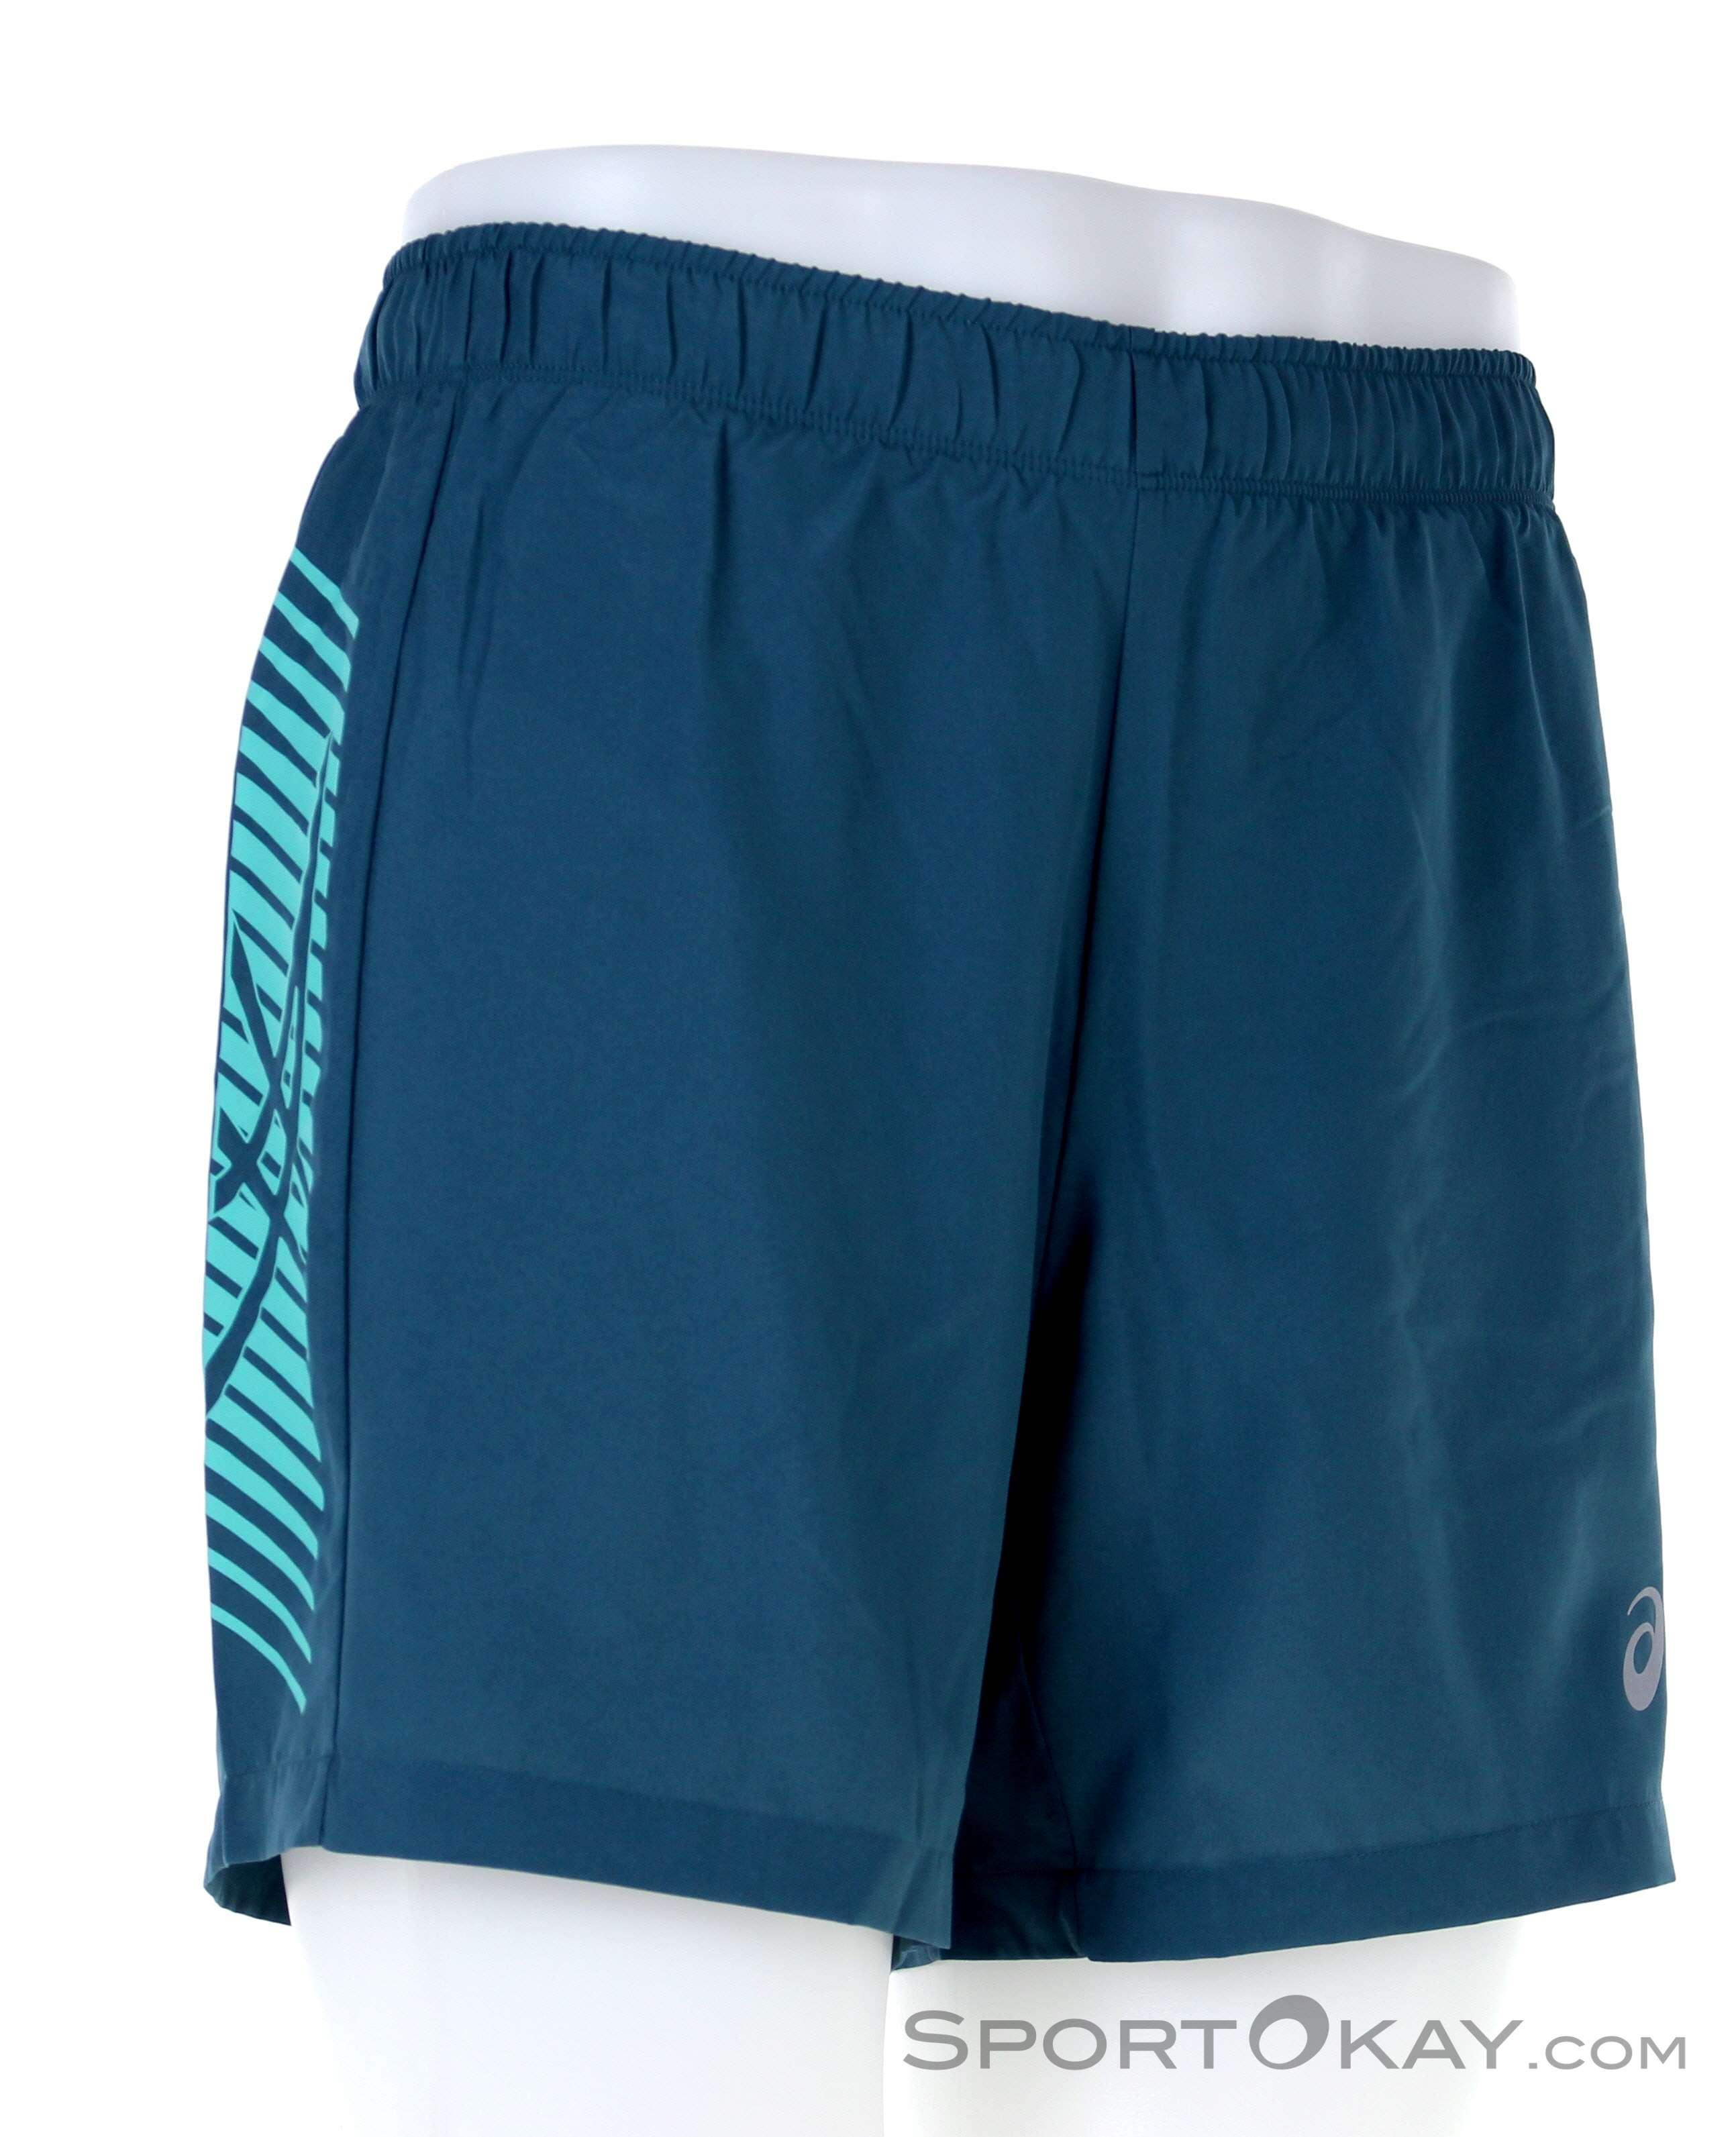 Asics Asics Icon 7IN Mens Running Shorts